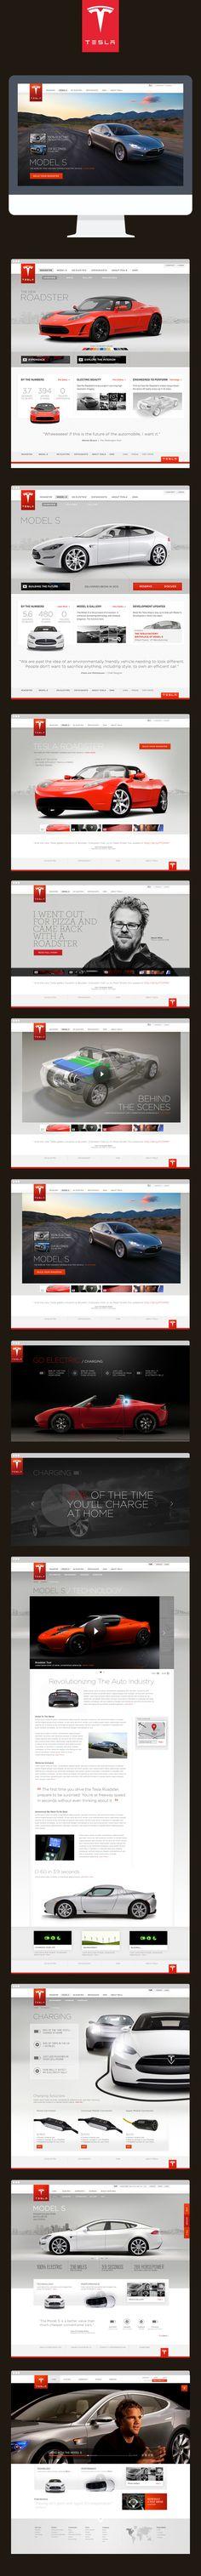 Cool Automotive Web Design. Tesla. #automotive #webdesign [http://www.pinterest.com/alfredchong/]